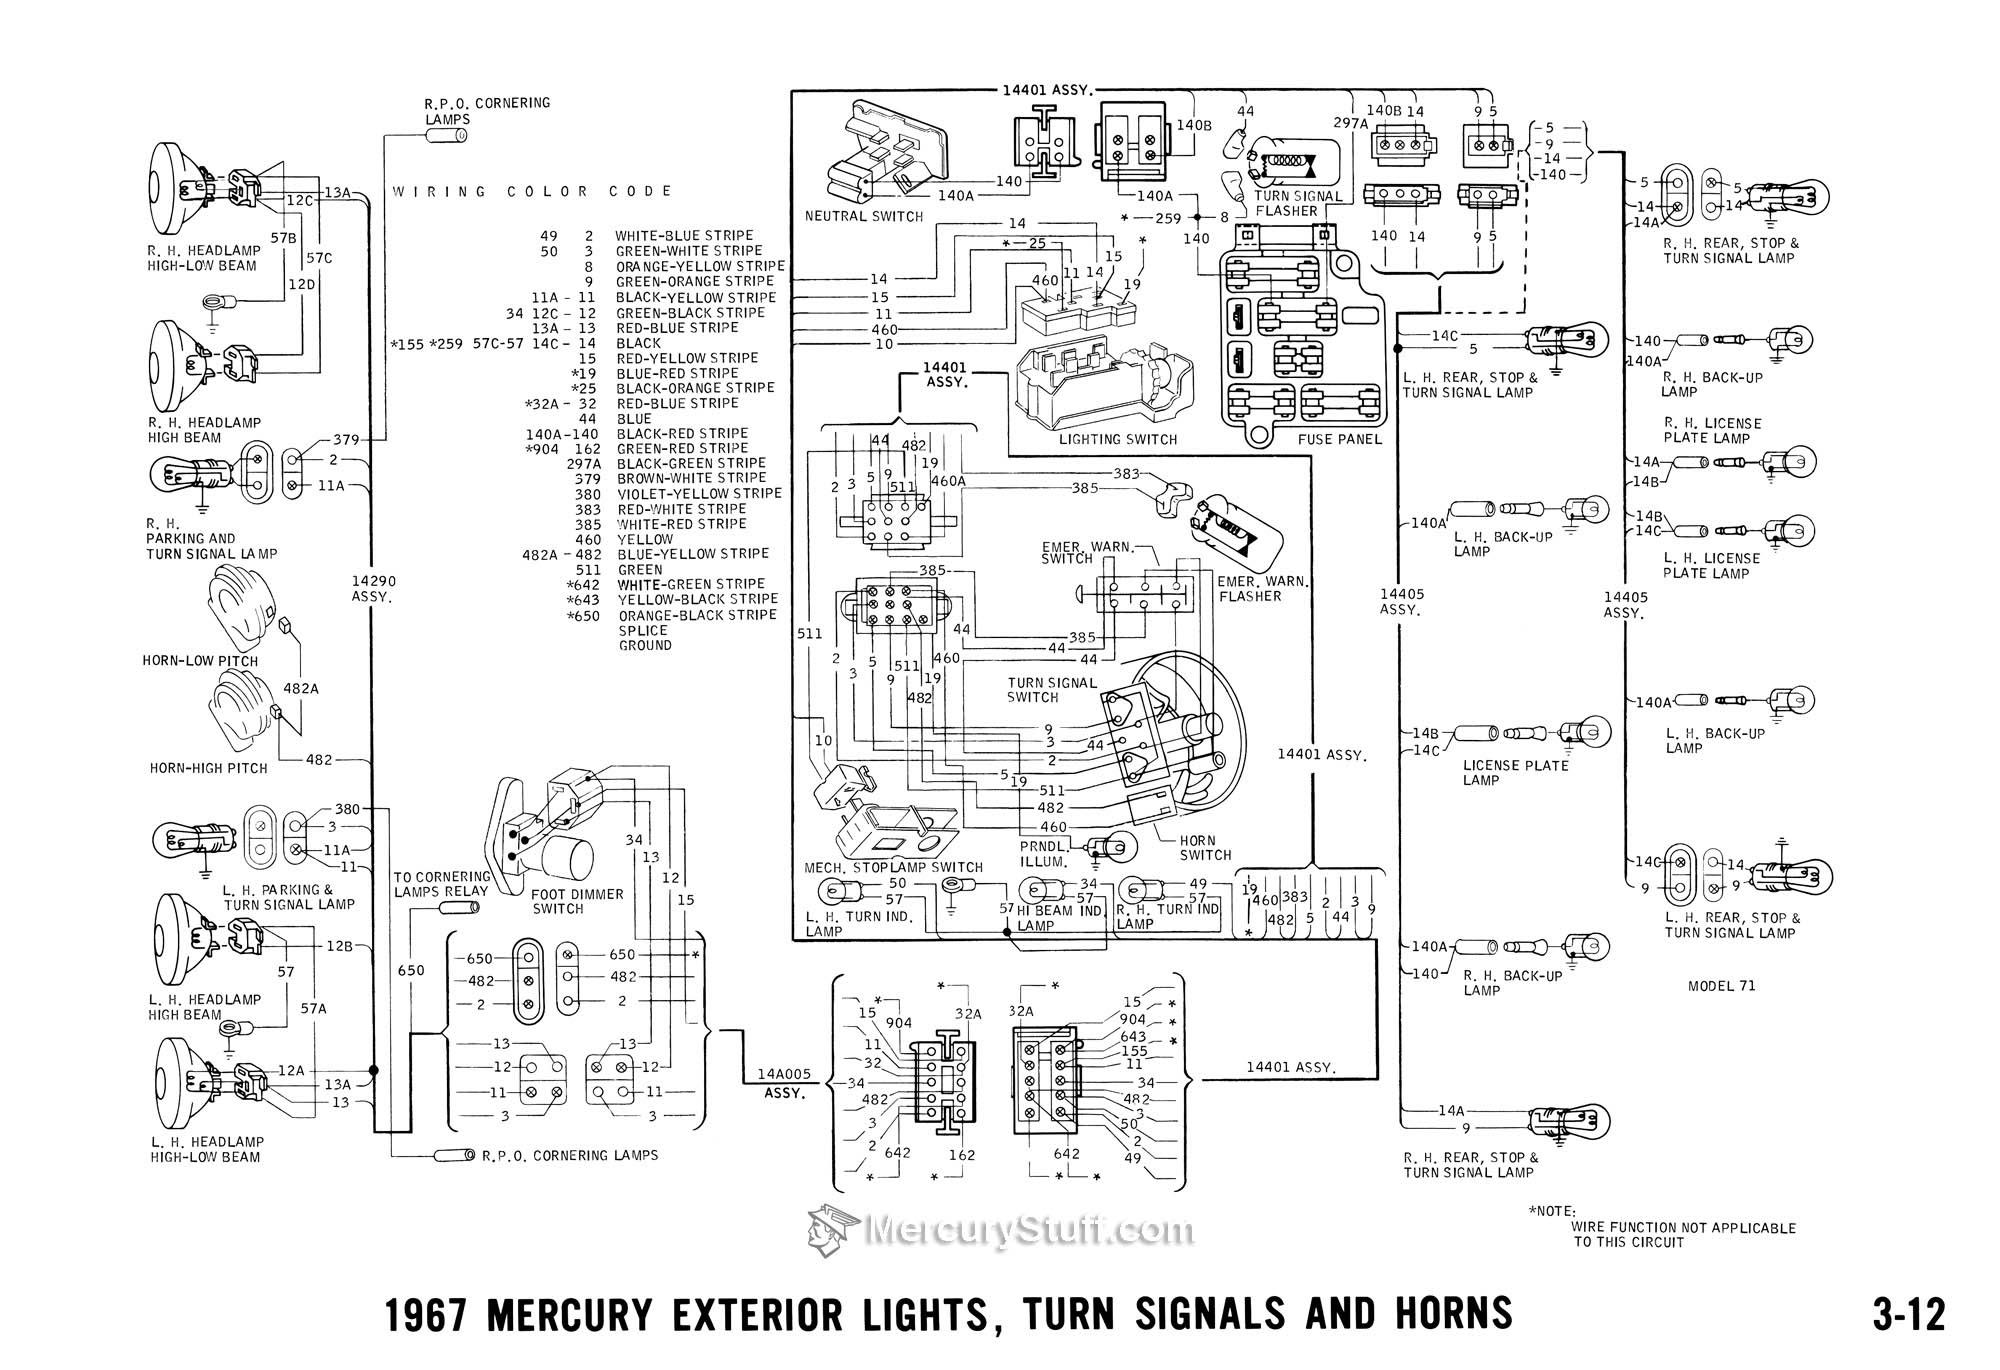 2000 Cougar Wiring Diagram Race Car Switch Panel Wiring For Wiring Diagram Schematics